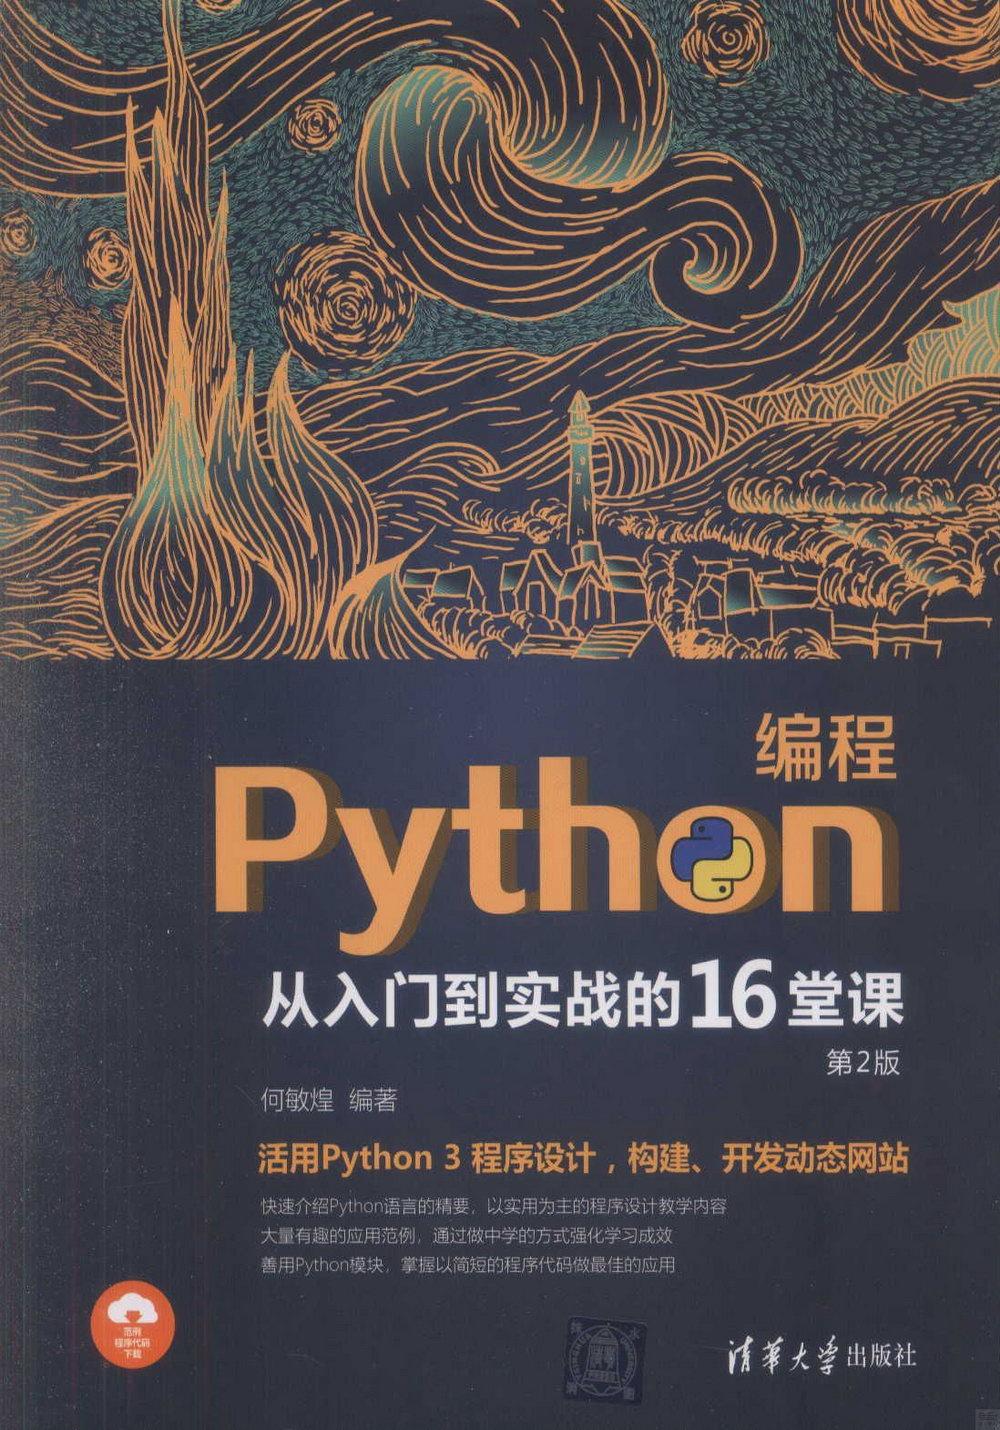 Python編程從入門到實戰的16堂課(第2版)